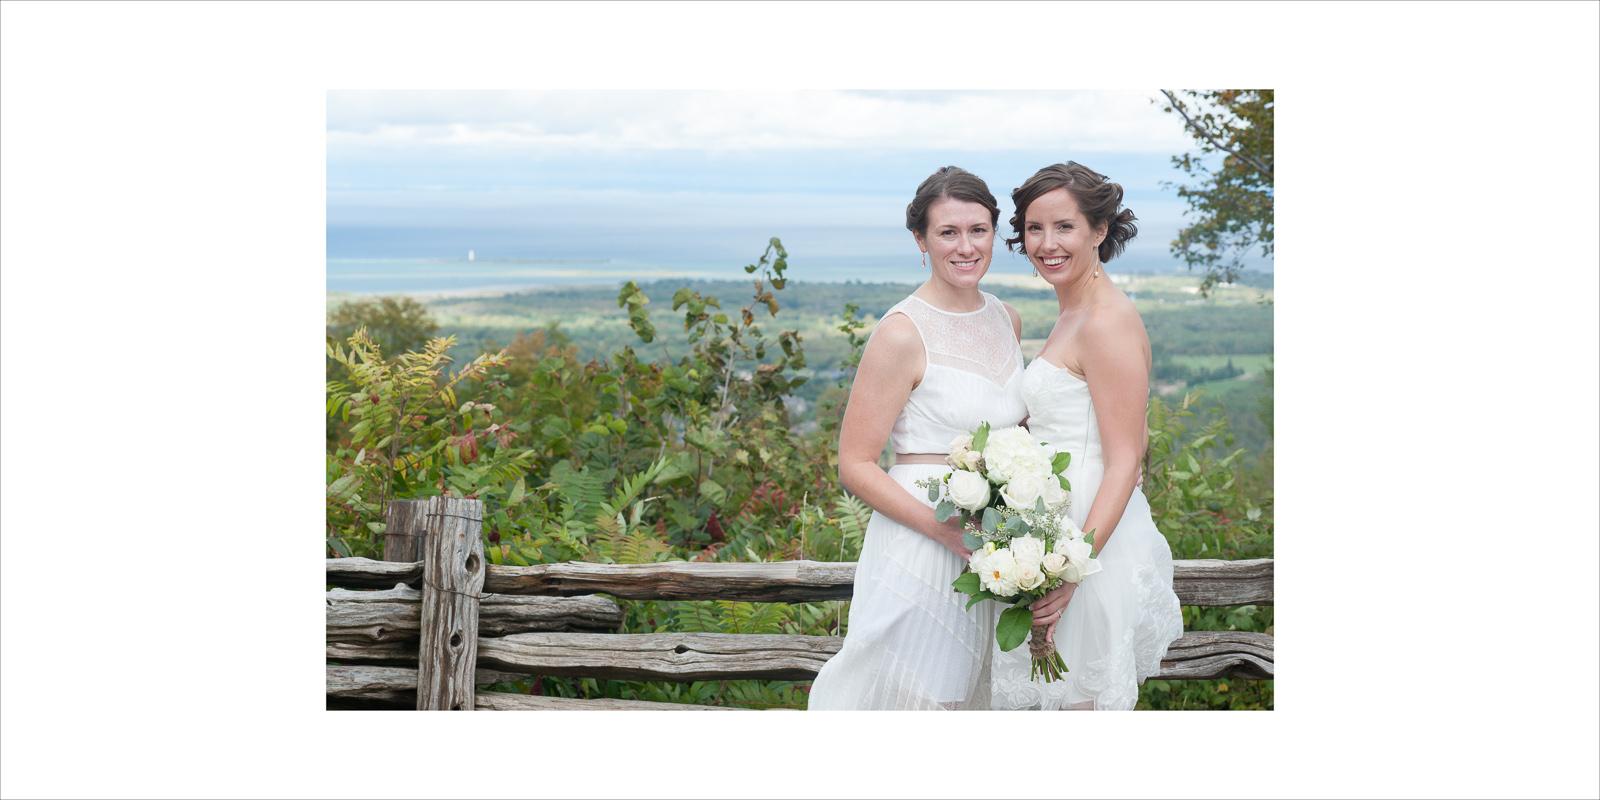 collingwood-wedding-photo-album-008.jpg